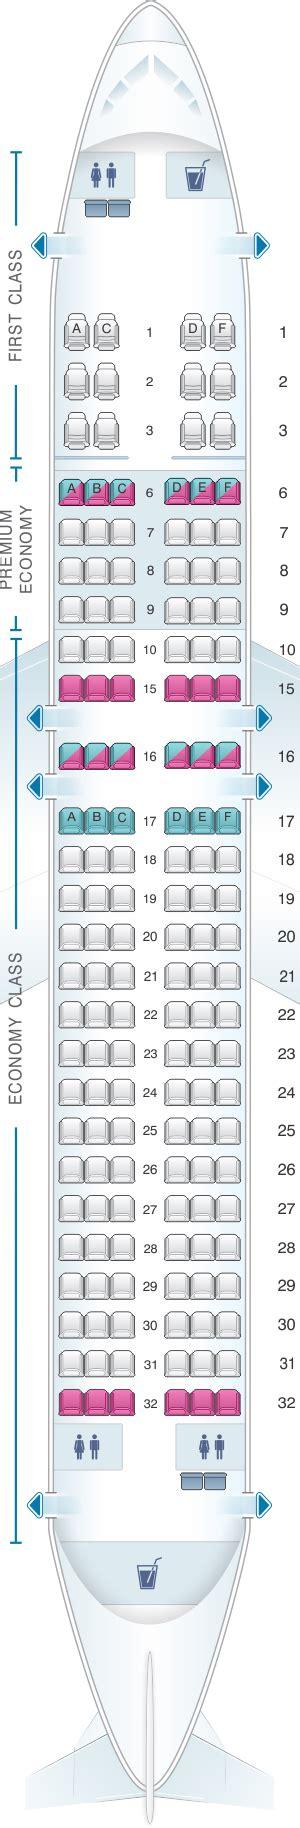 Seat Map Alaska Airlines - Horizon Air Airbus A320 214